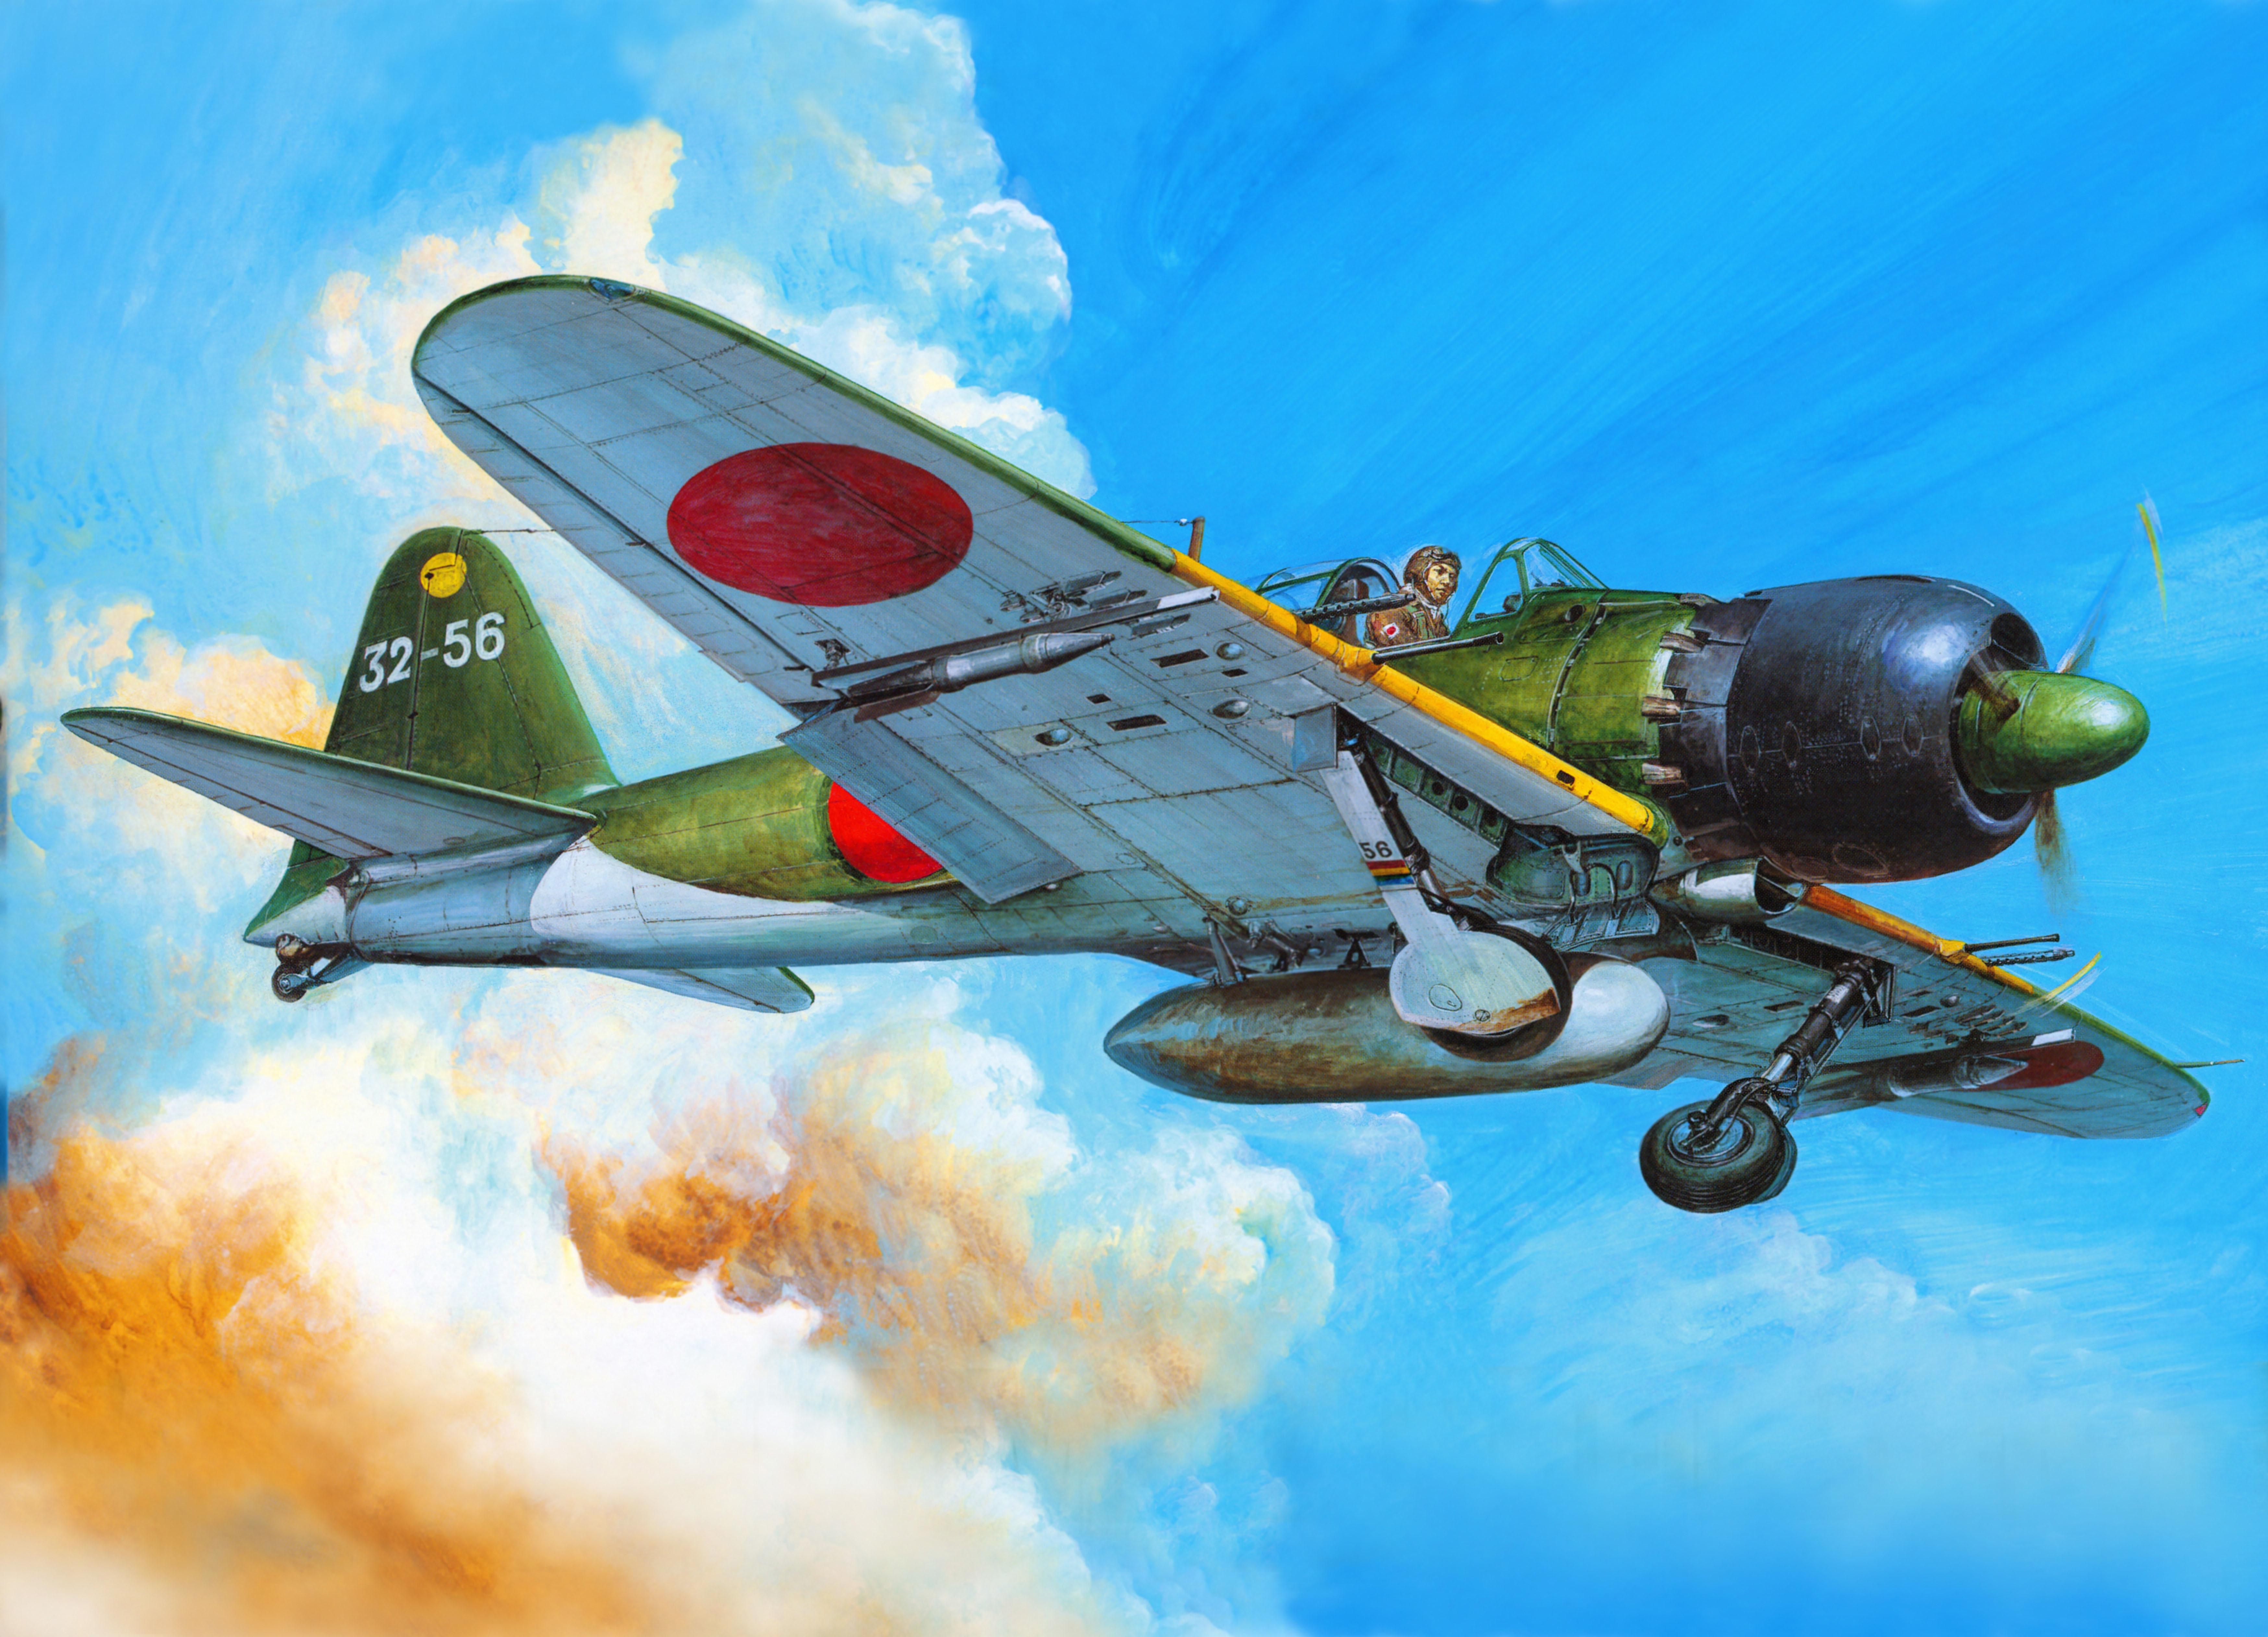 99 mitsubishi a6m zero japan wwii pacificocean - HD1920×1386